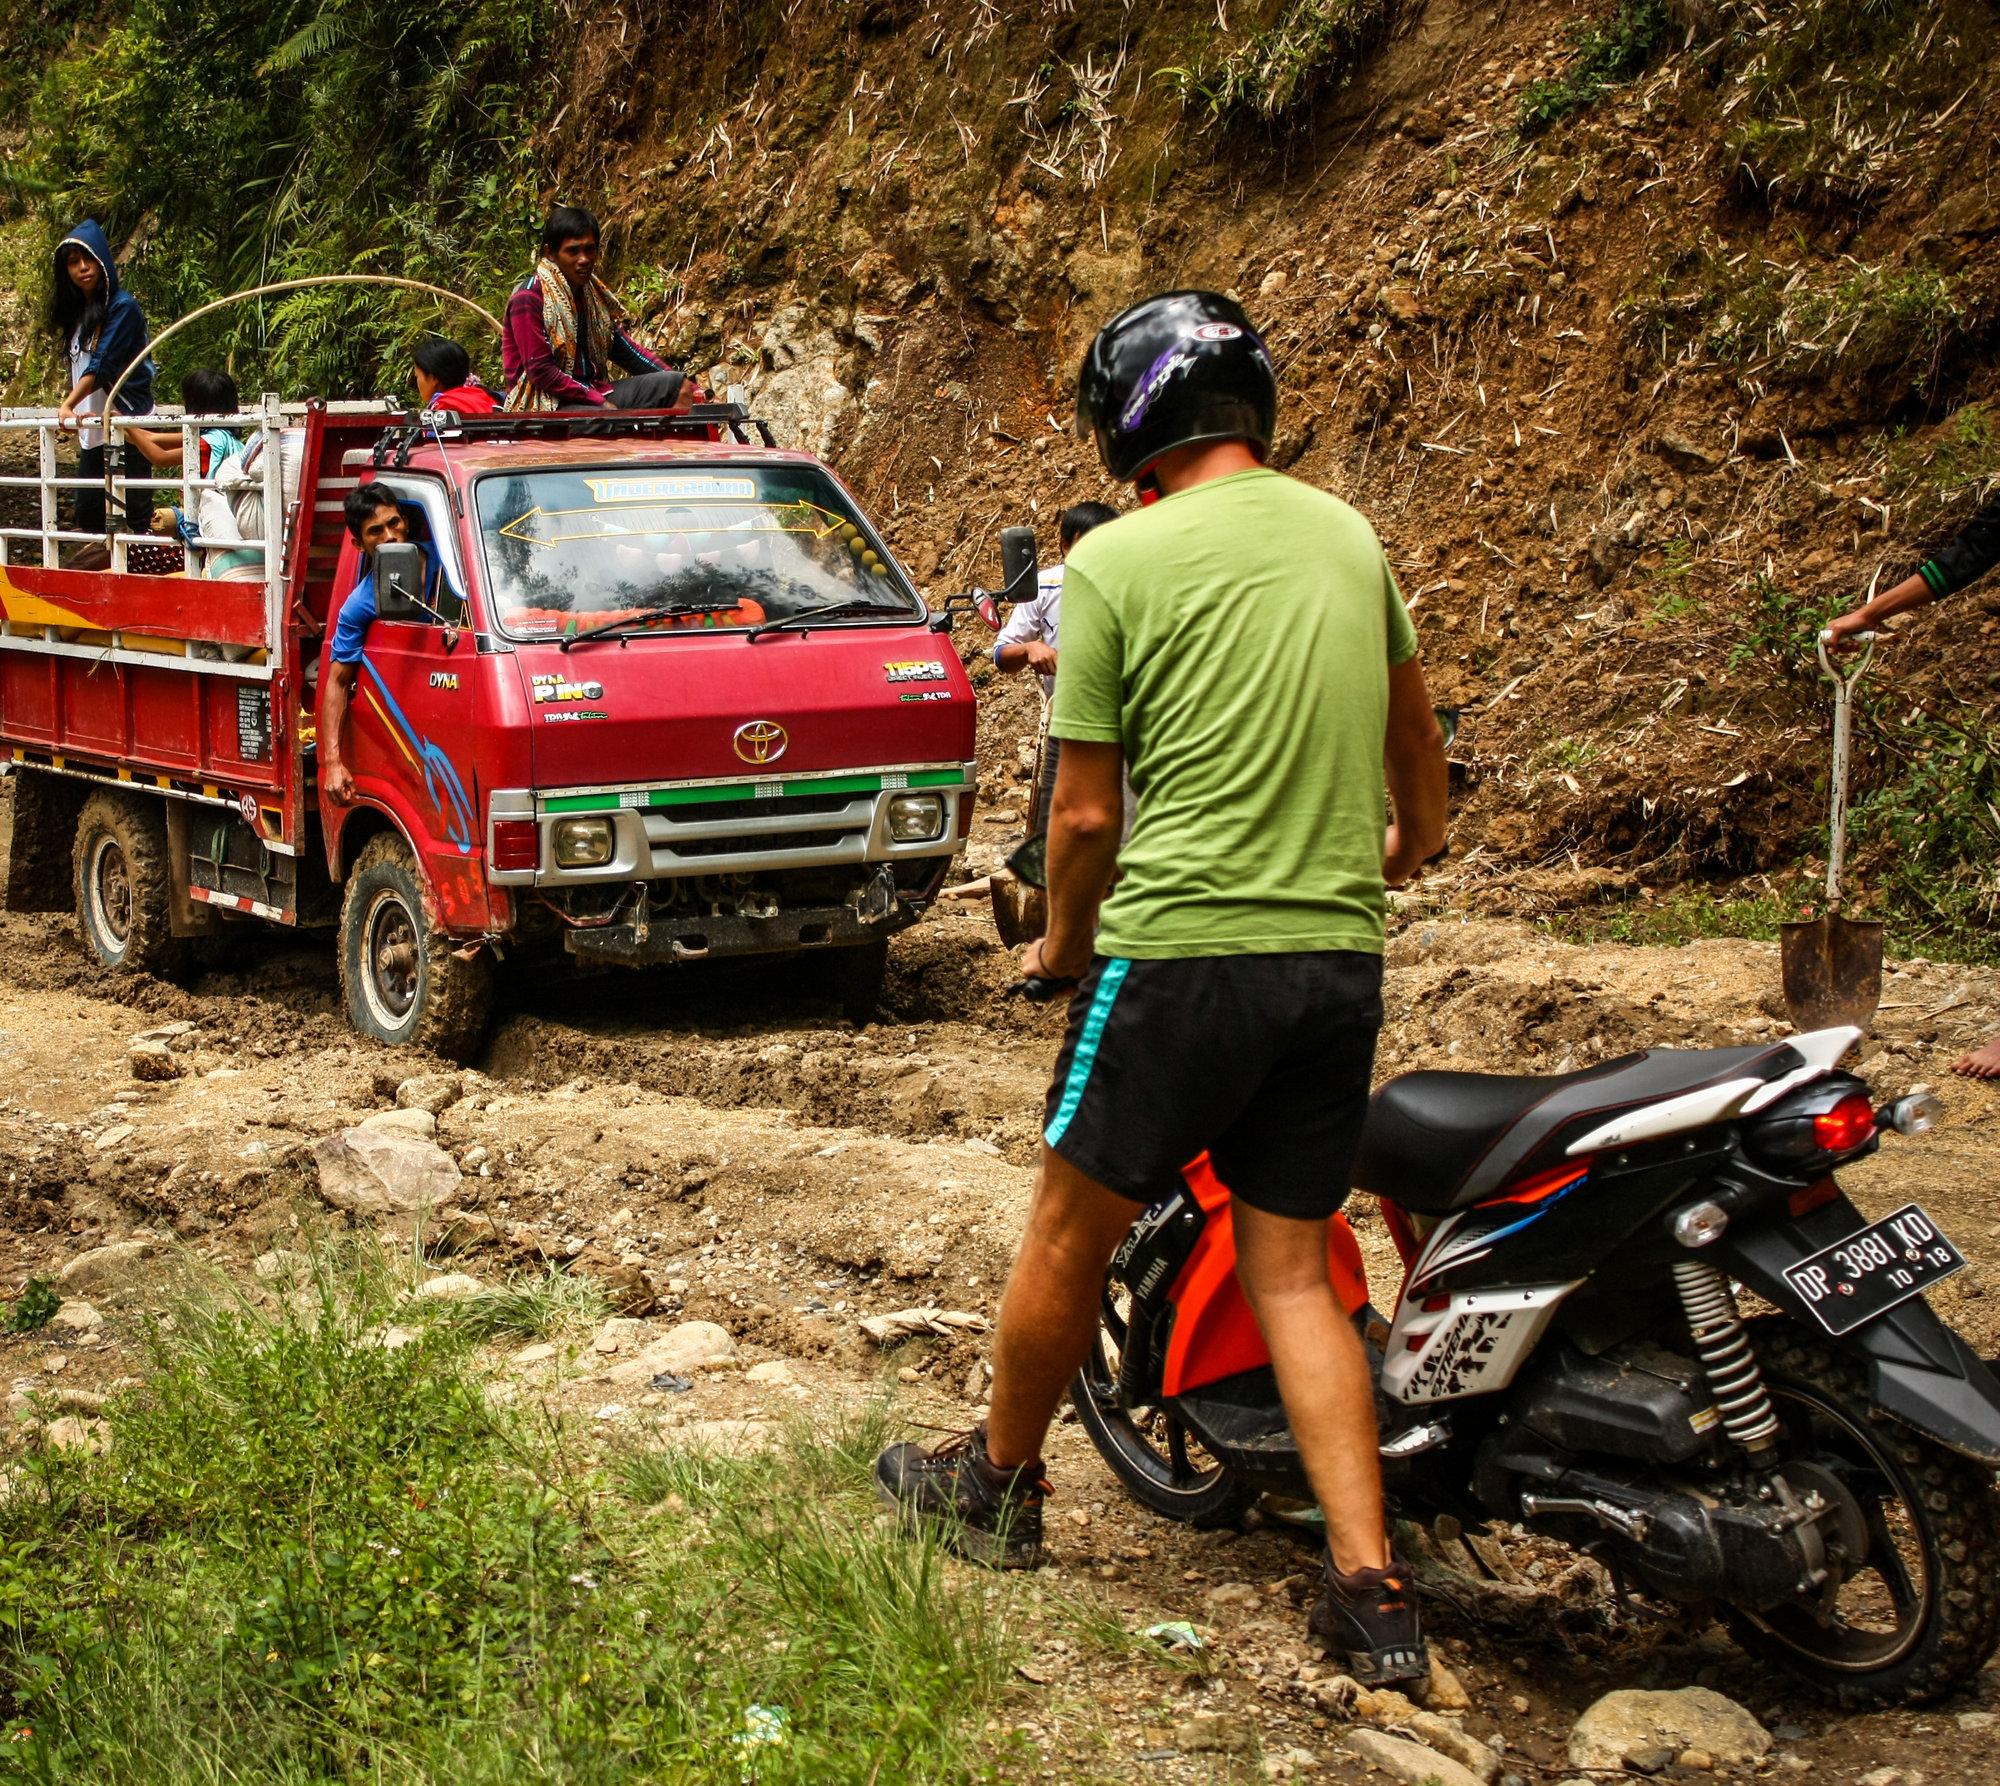 indonesia-tana-toraja-scooter.jpg